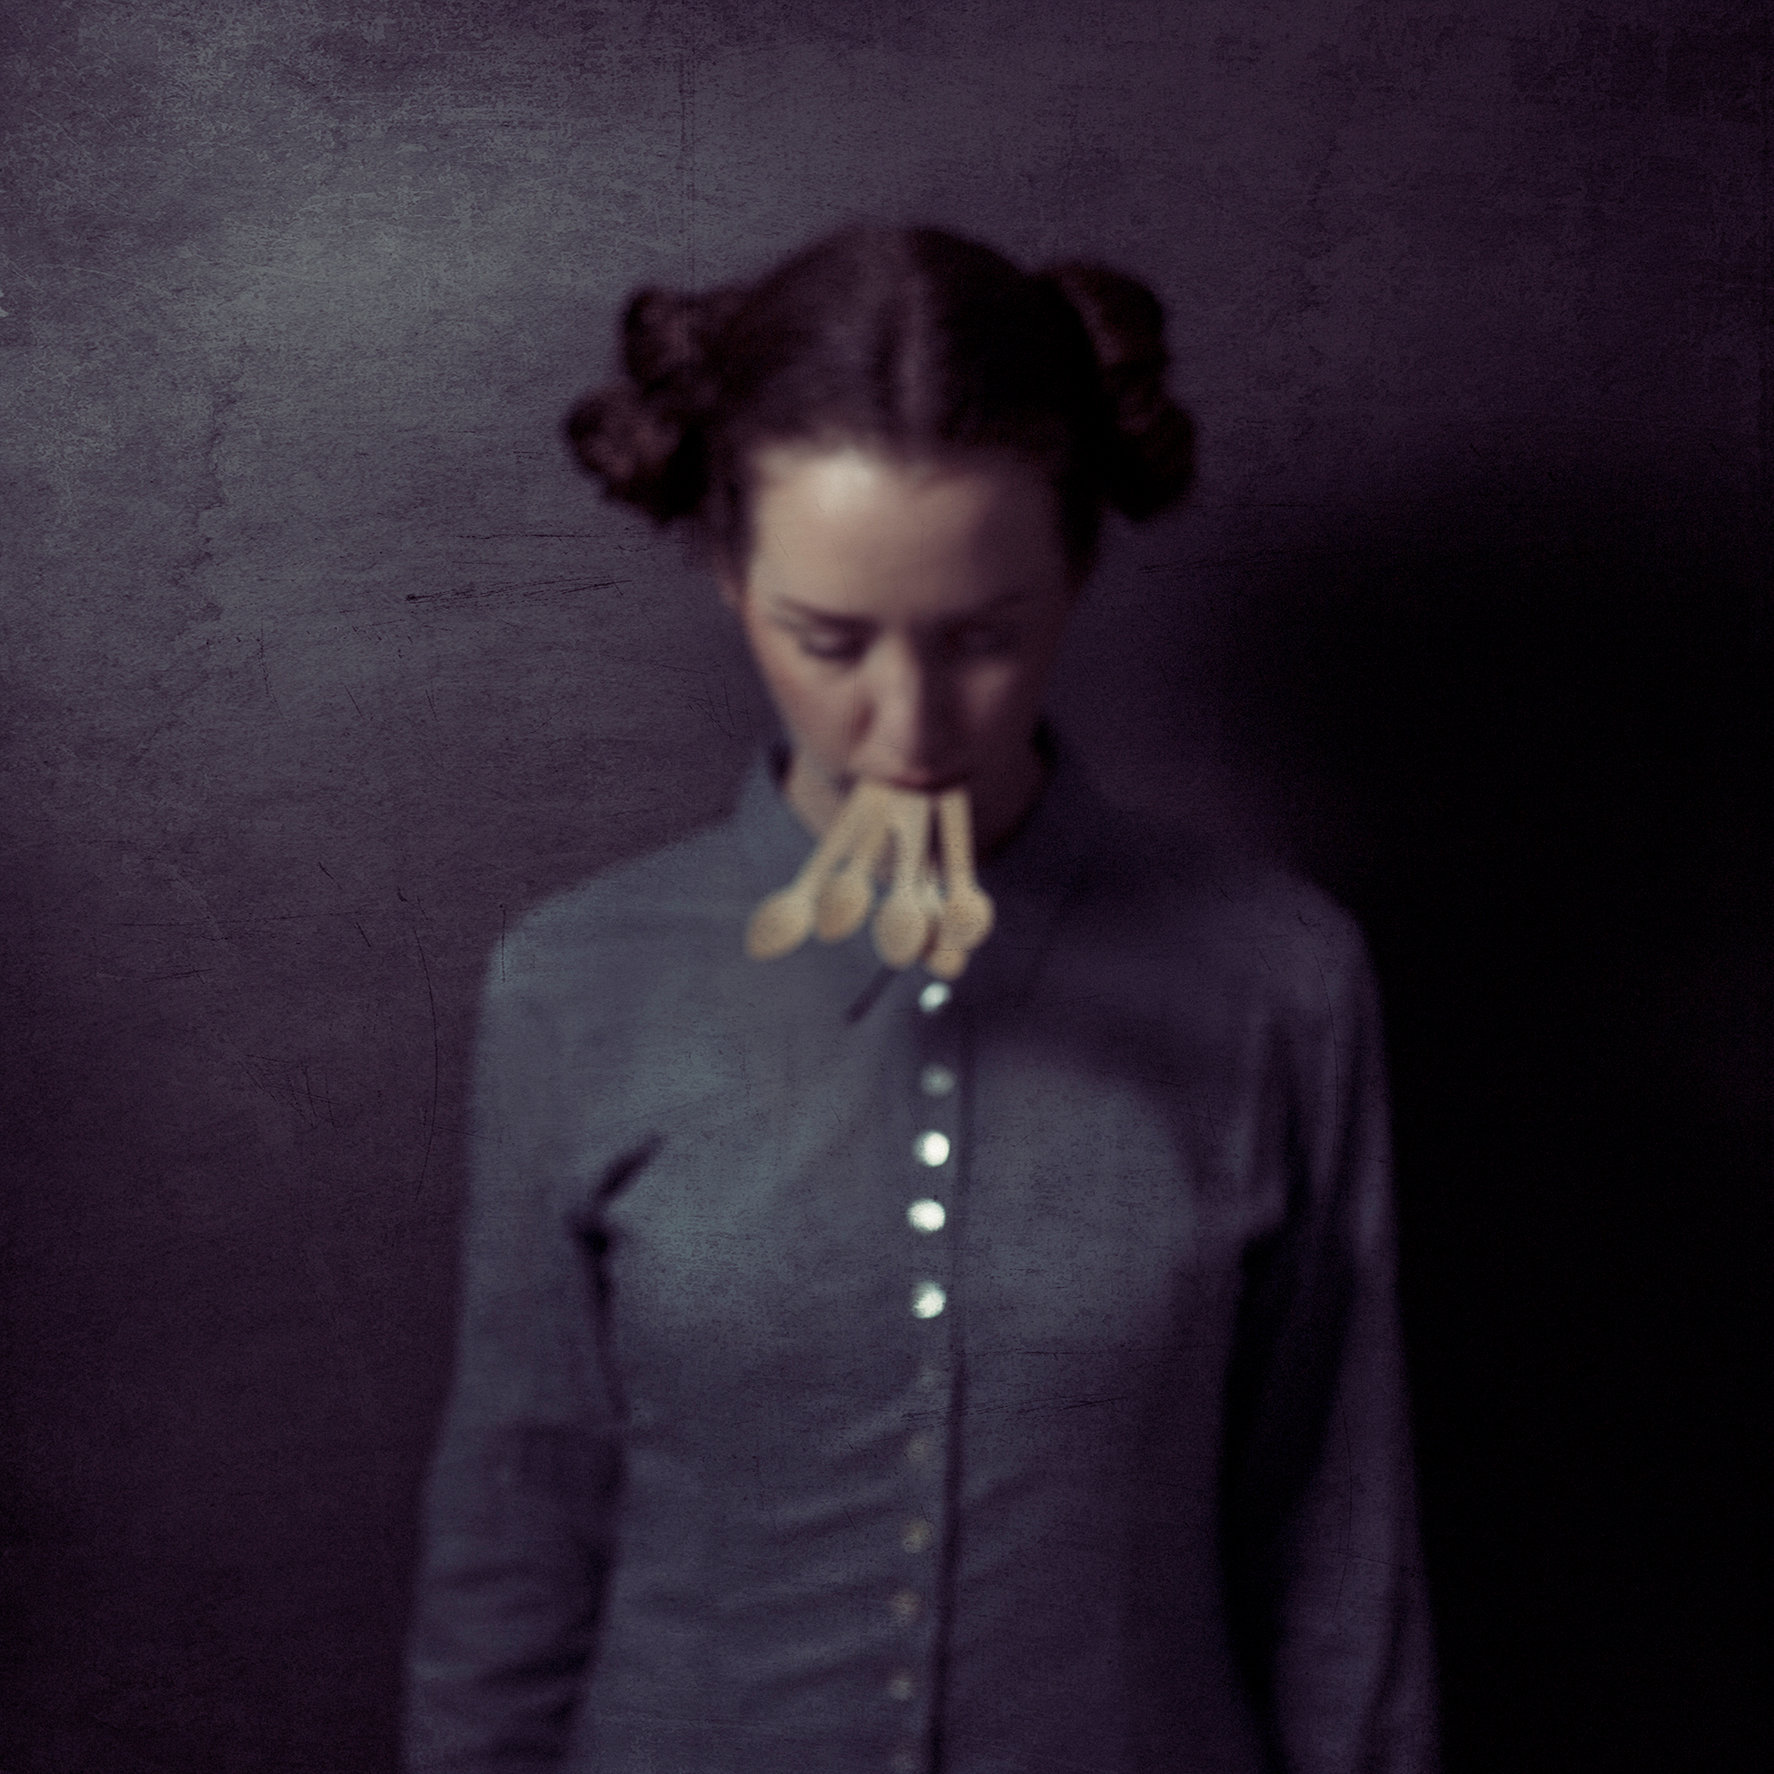 The Feeding (c)2014 - Kurt Liefsoons